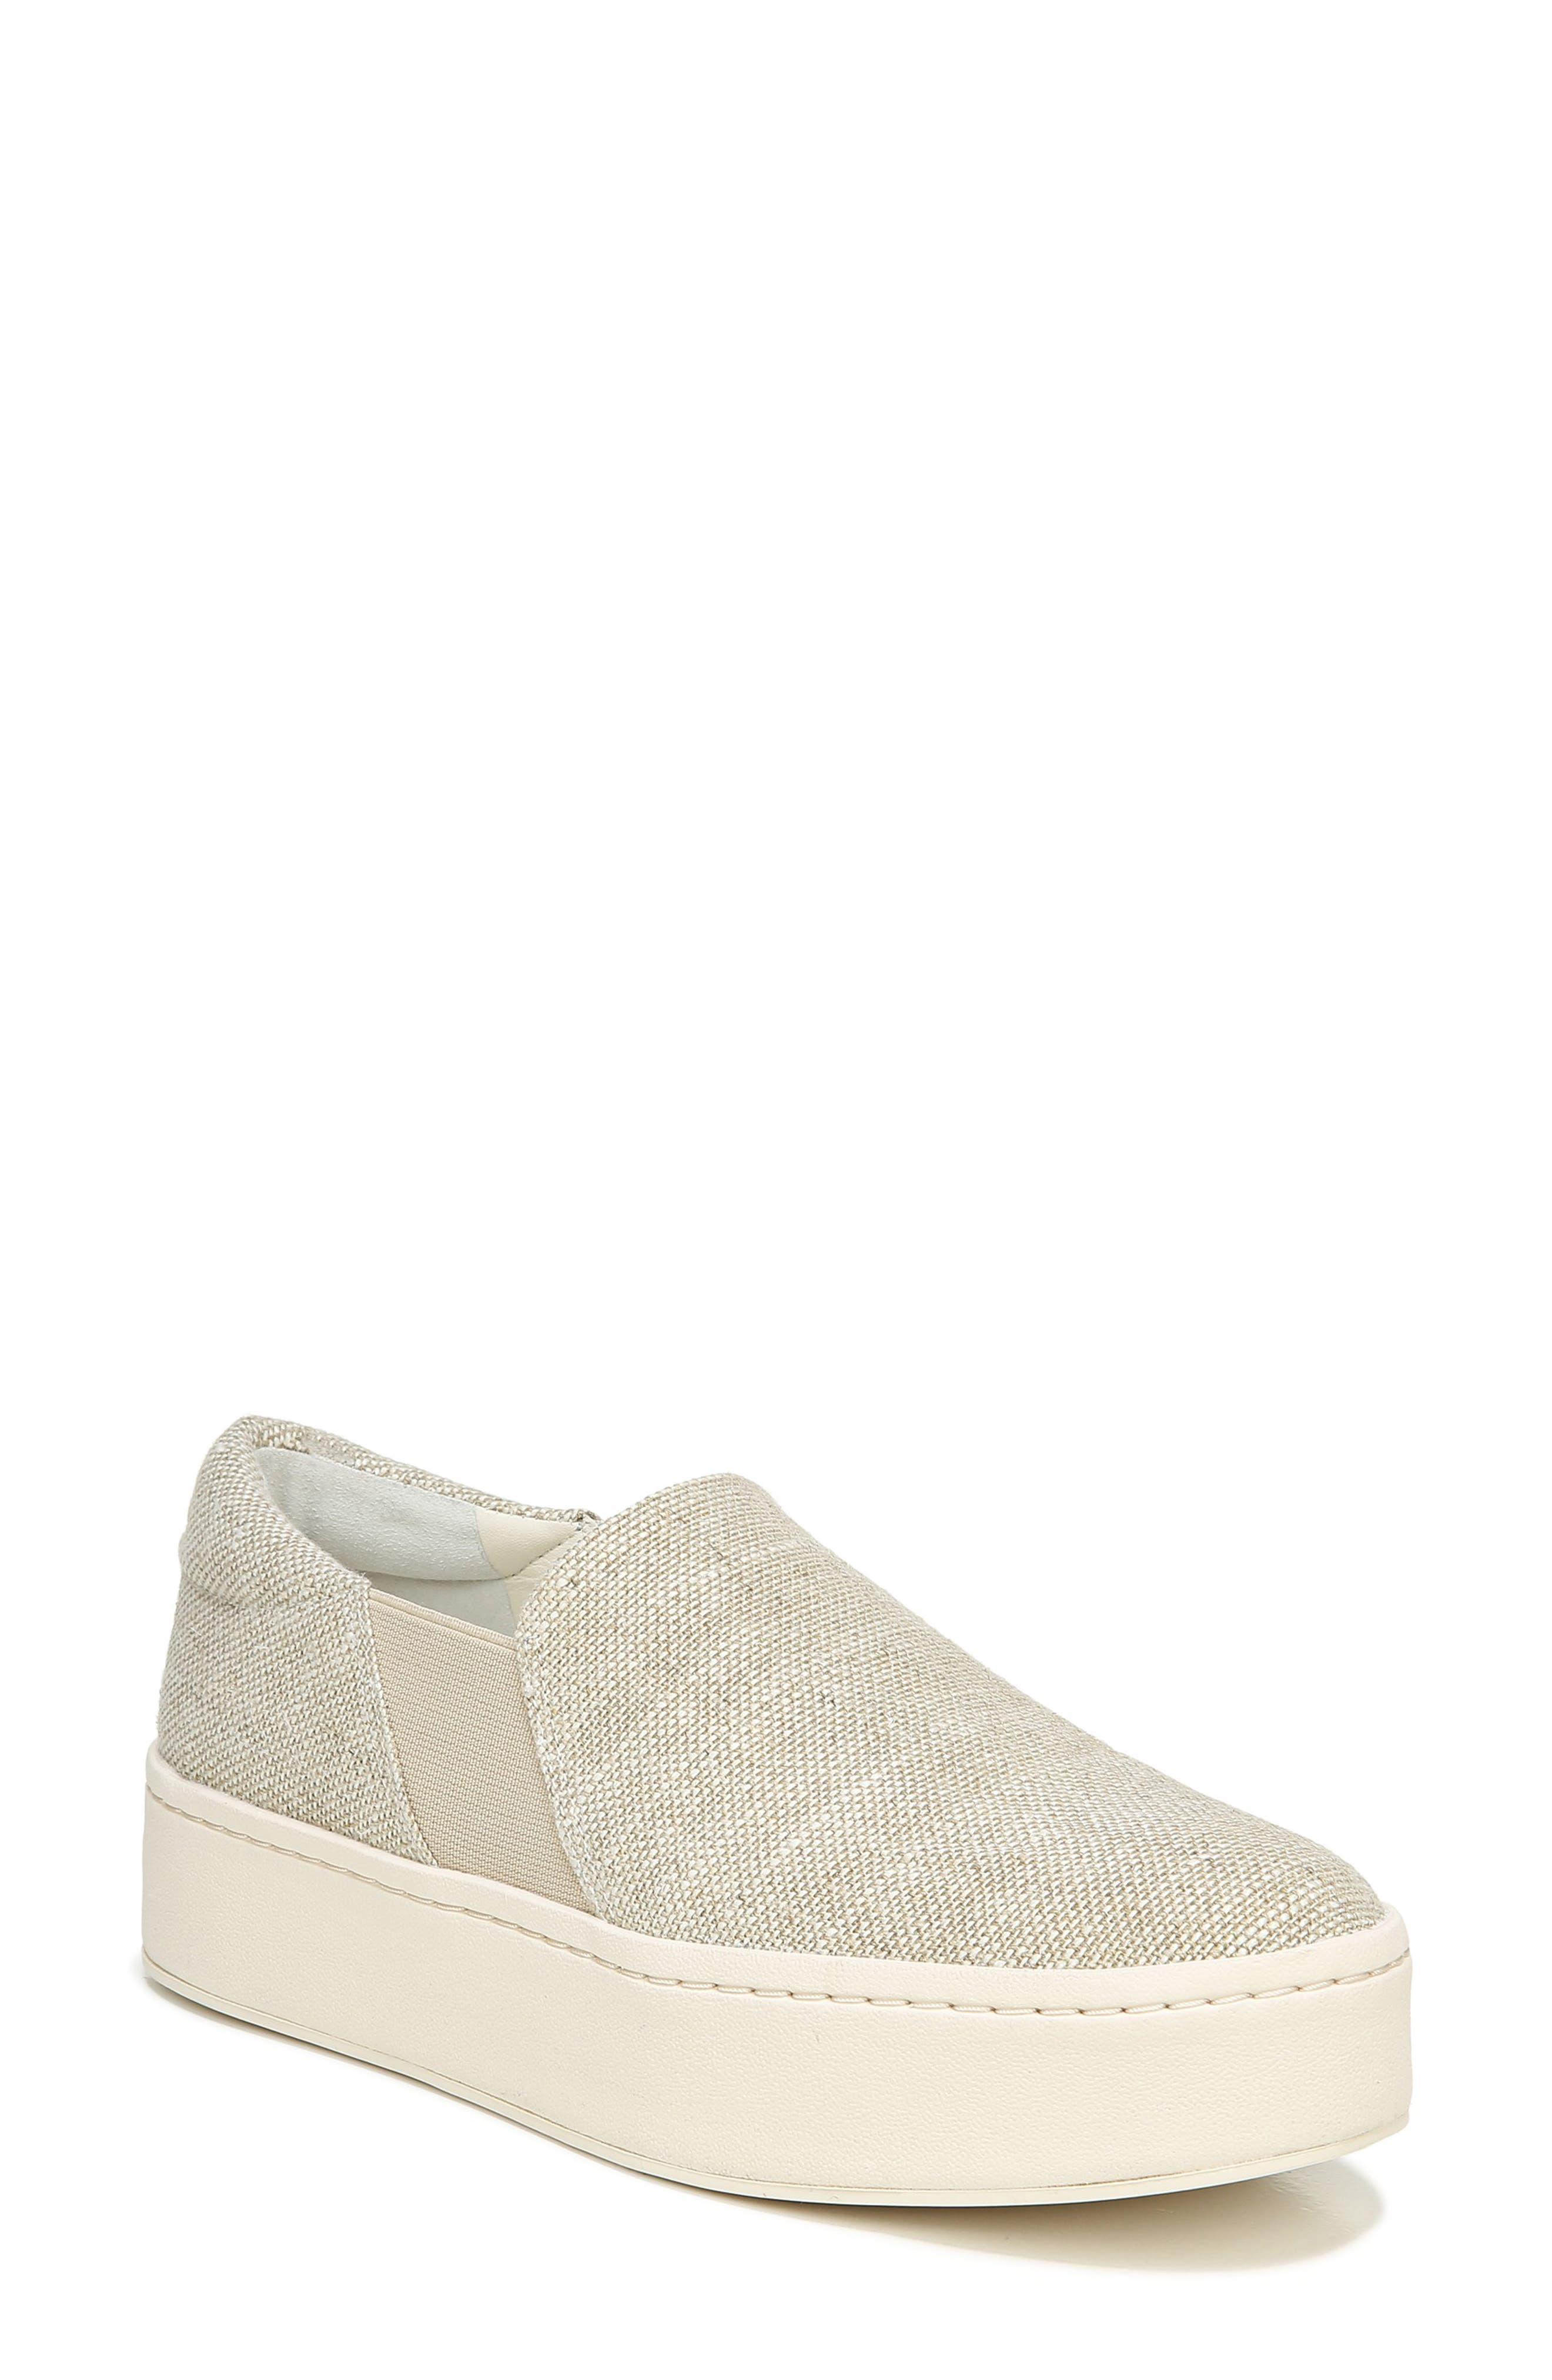 Vince | Warren Slip-On Platform Sneaker